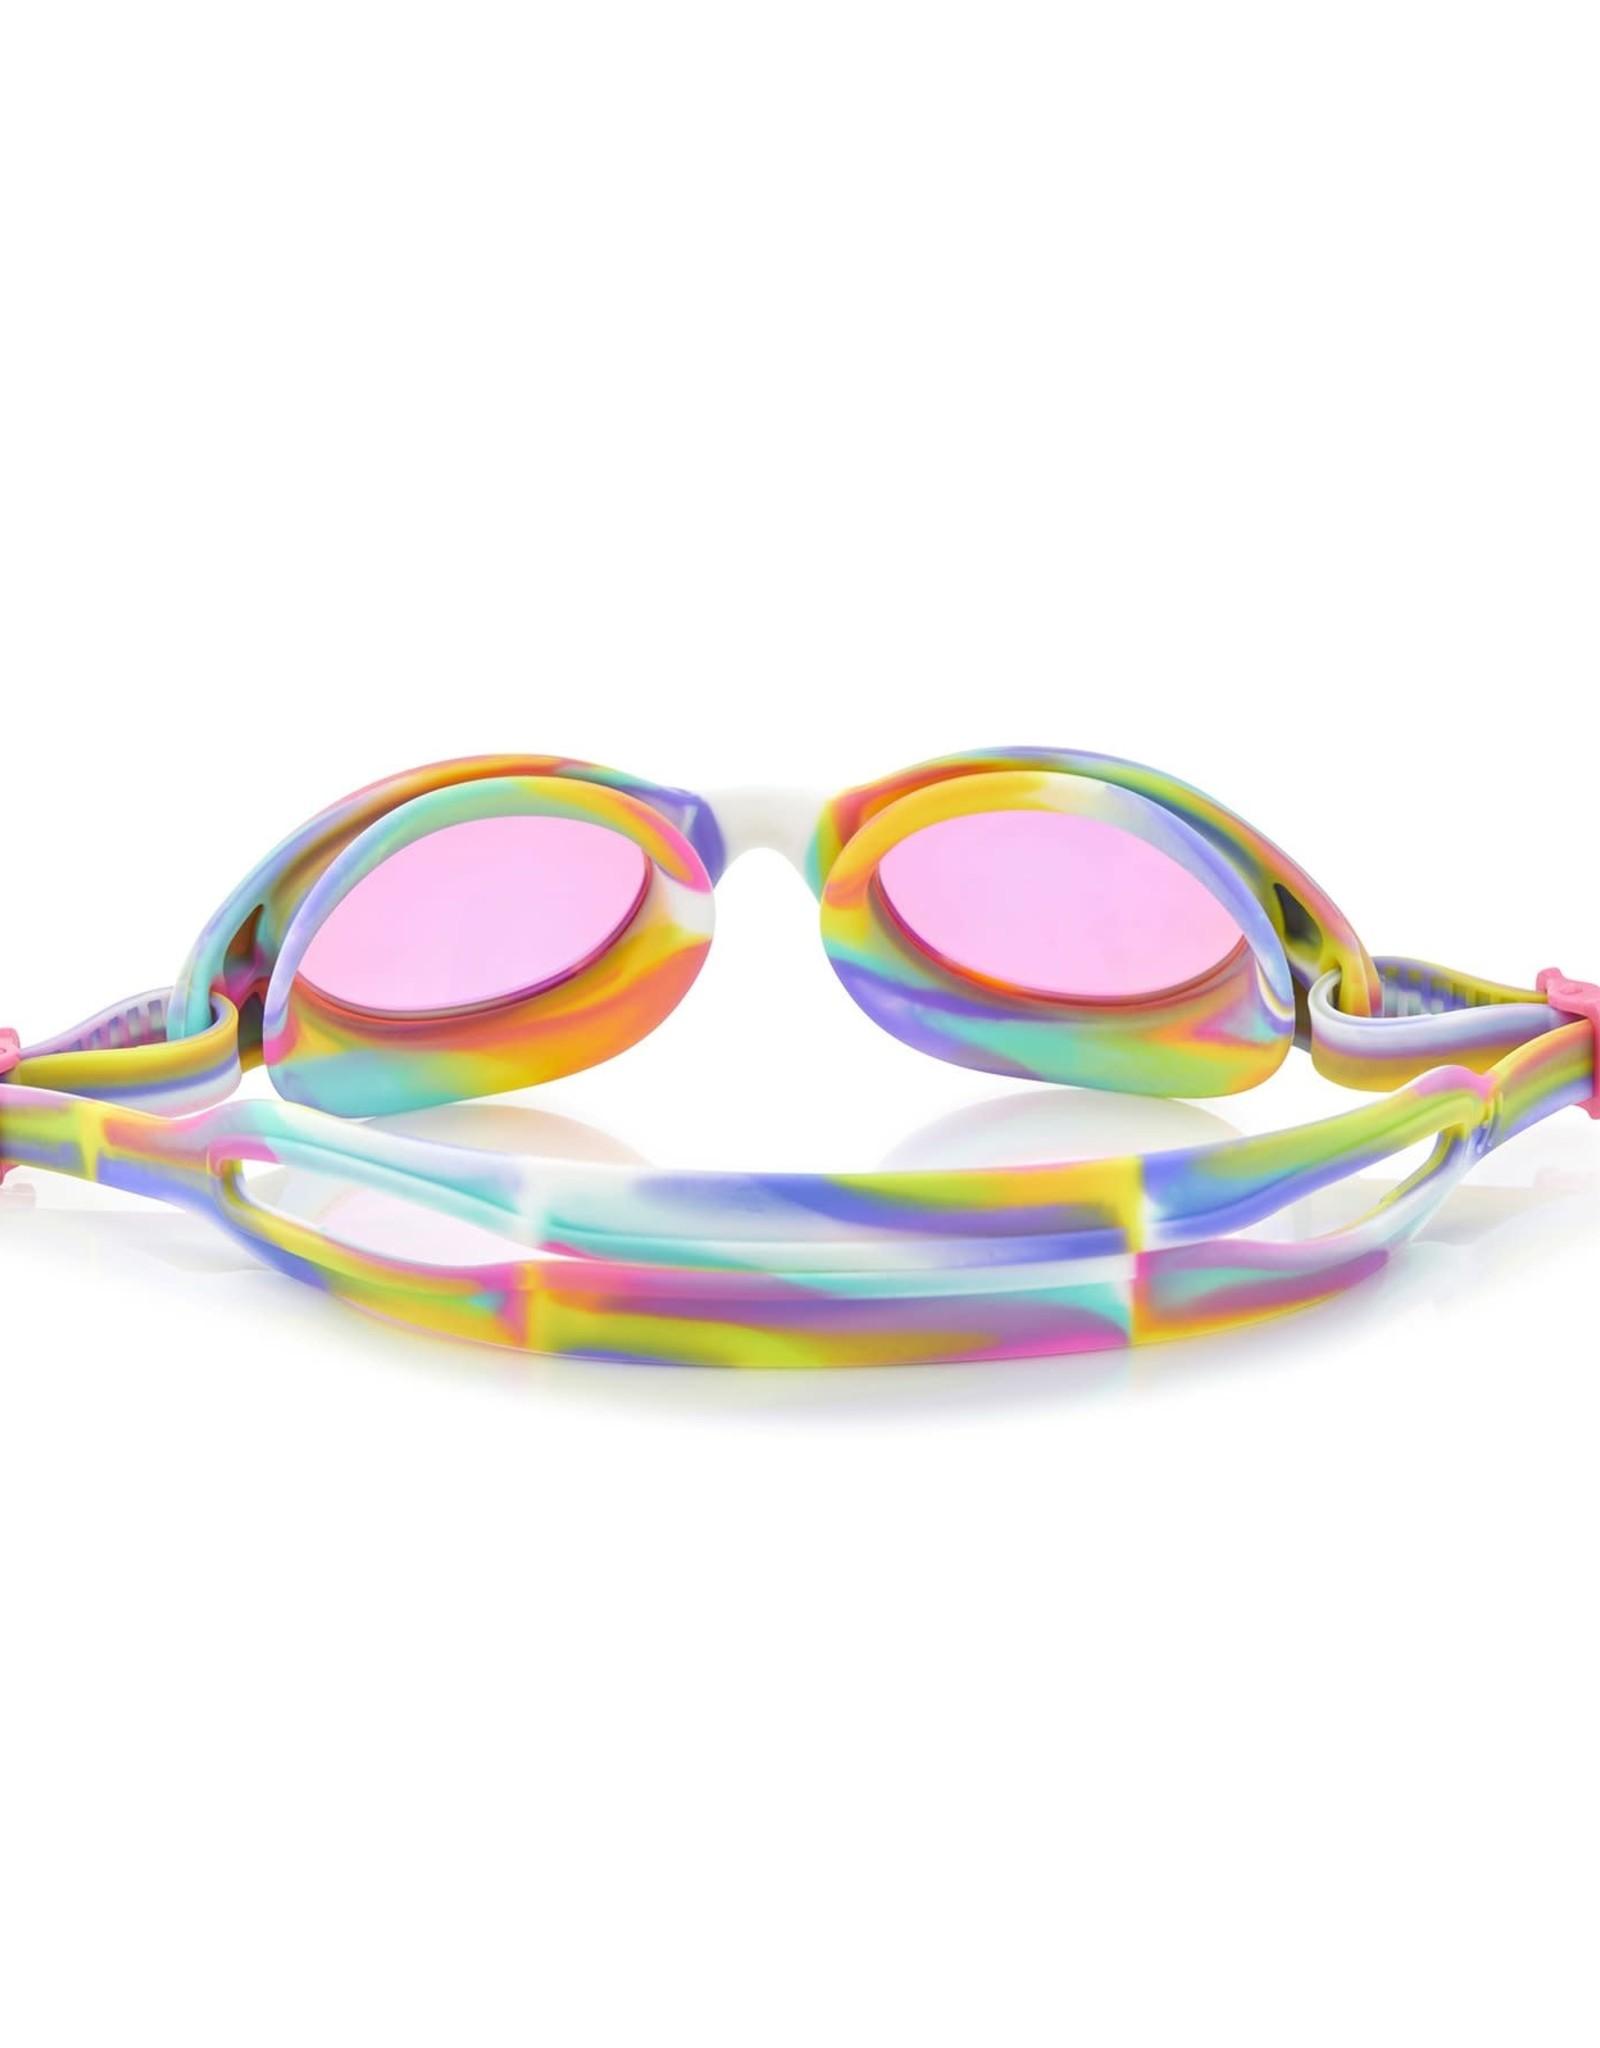 Bling2O Salt Water Taffy Goggles